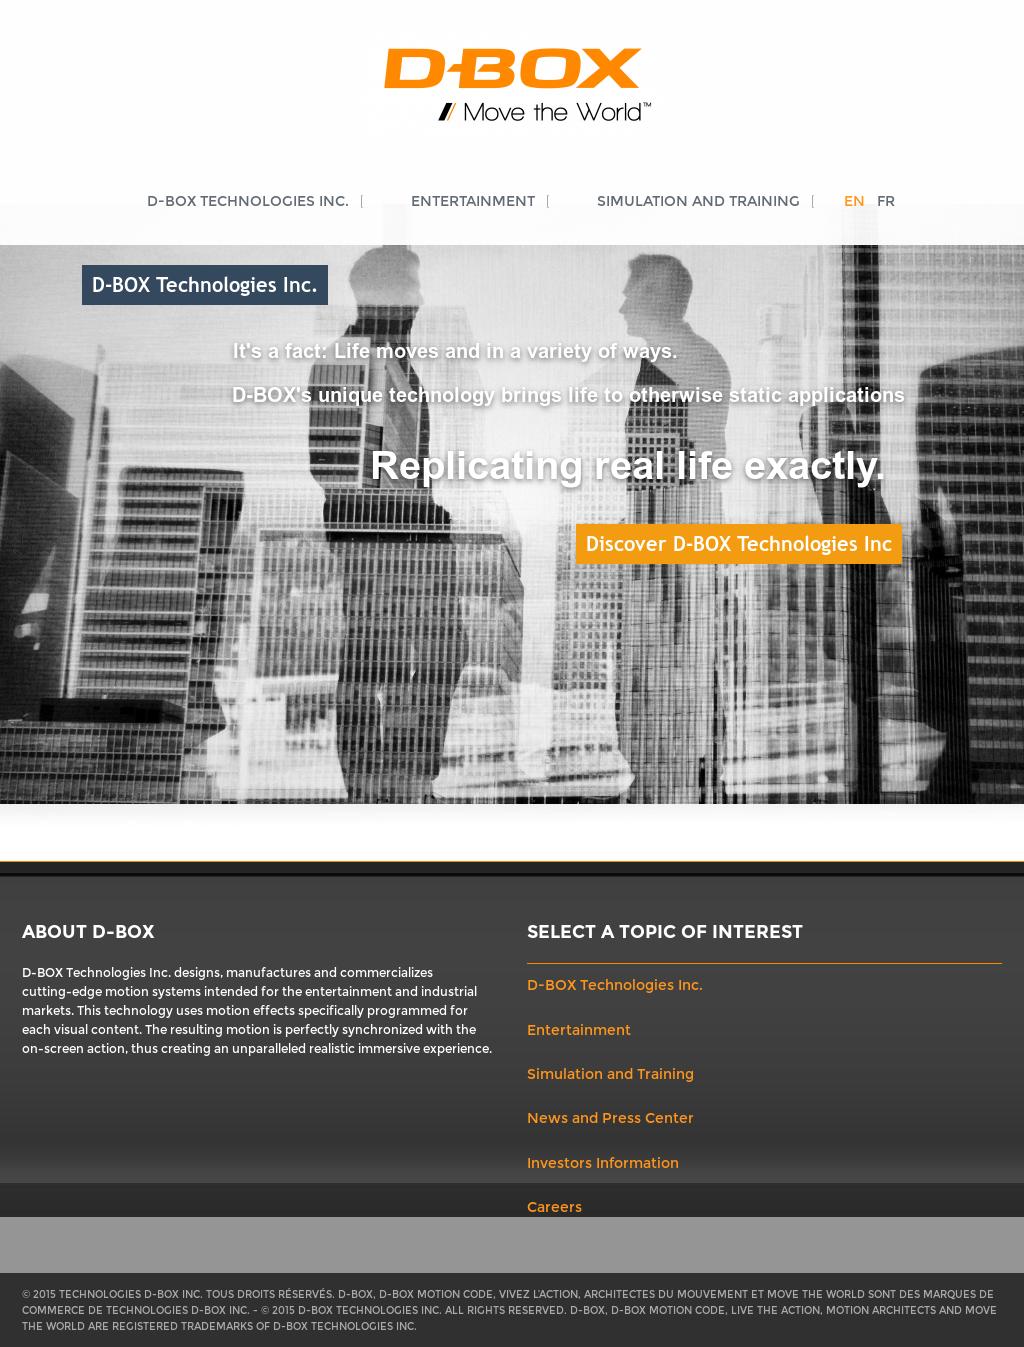 7bd7da37aa9 D-BOX Competitors, Revenue and Employees - Owler Company Profile